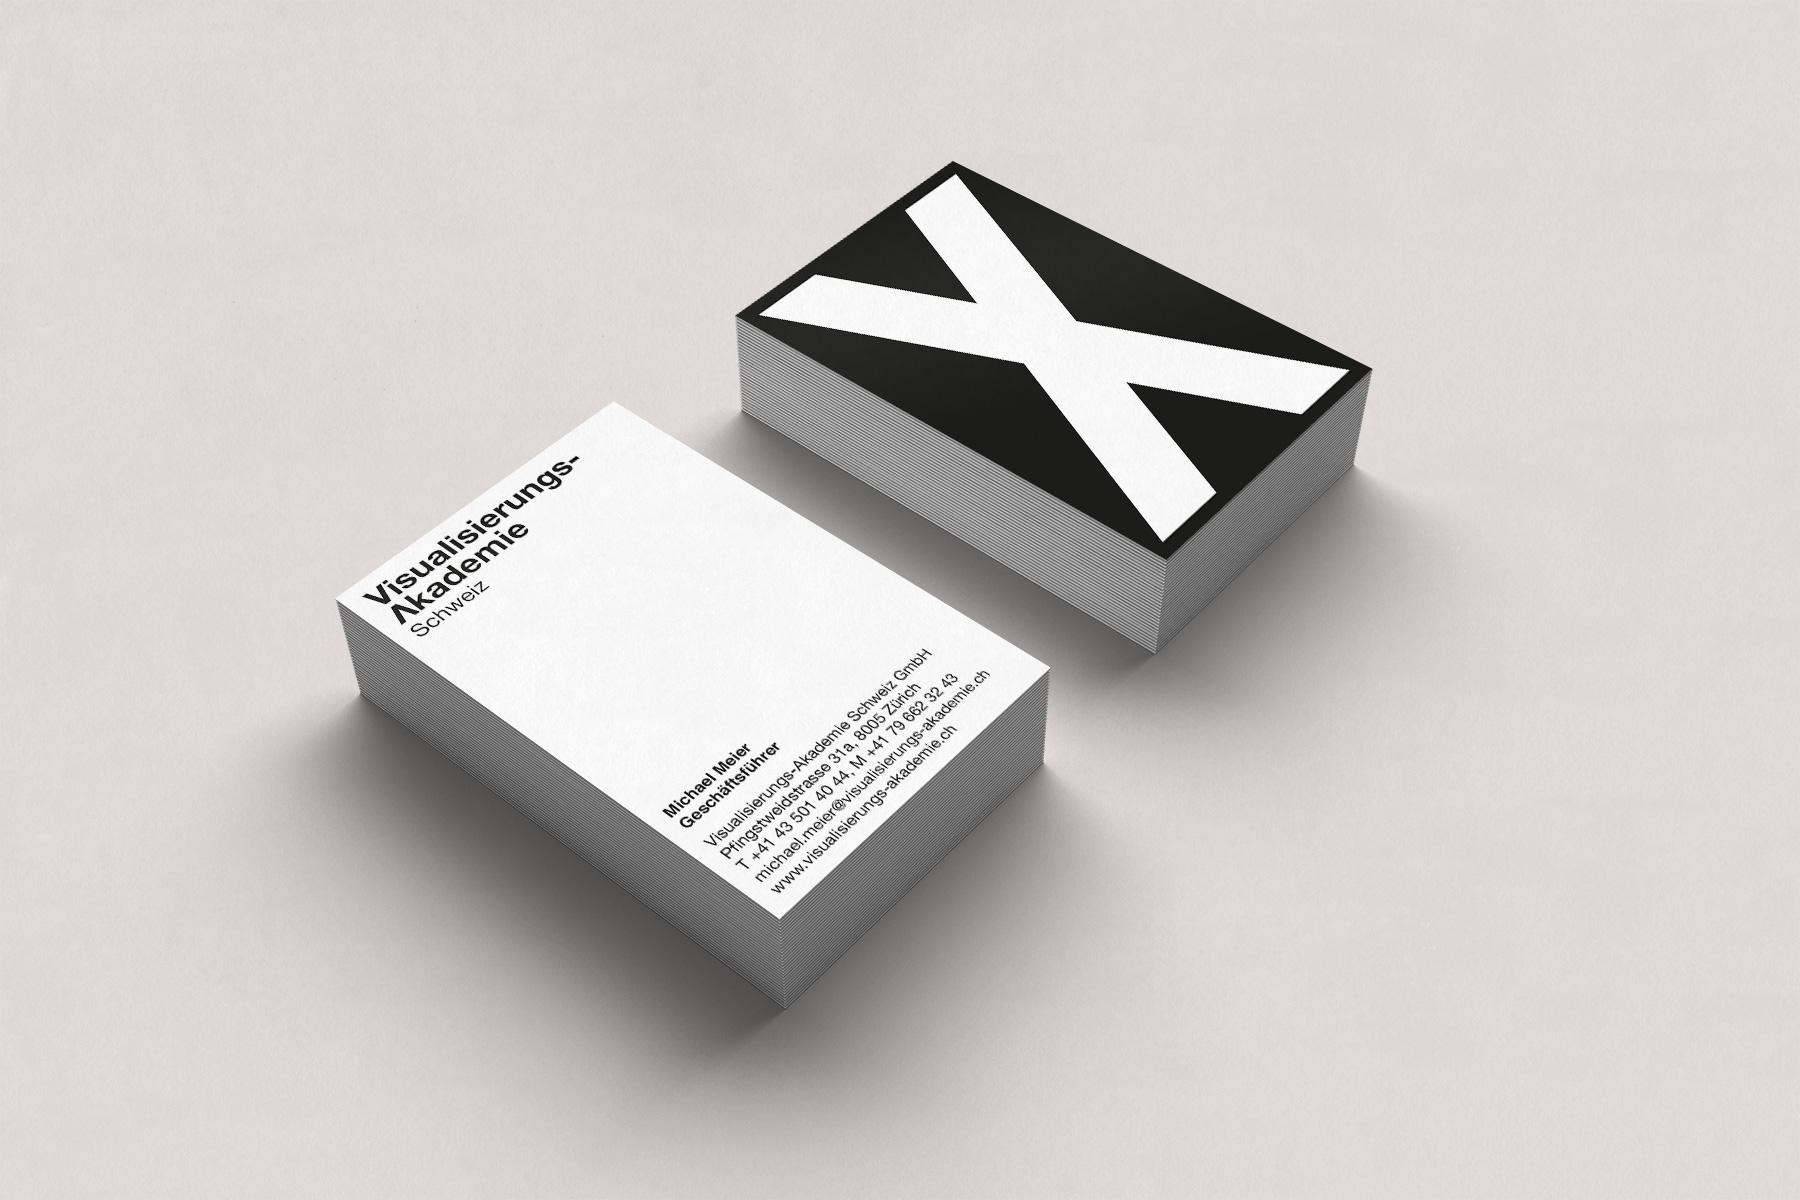 visualisierungs-akademie_visitenkarten